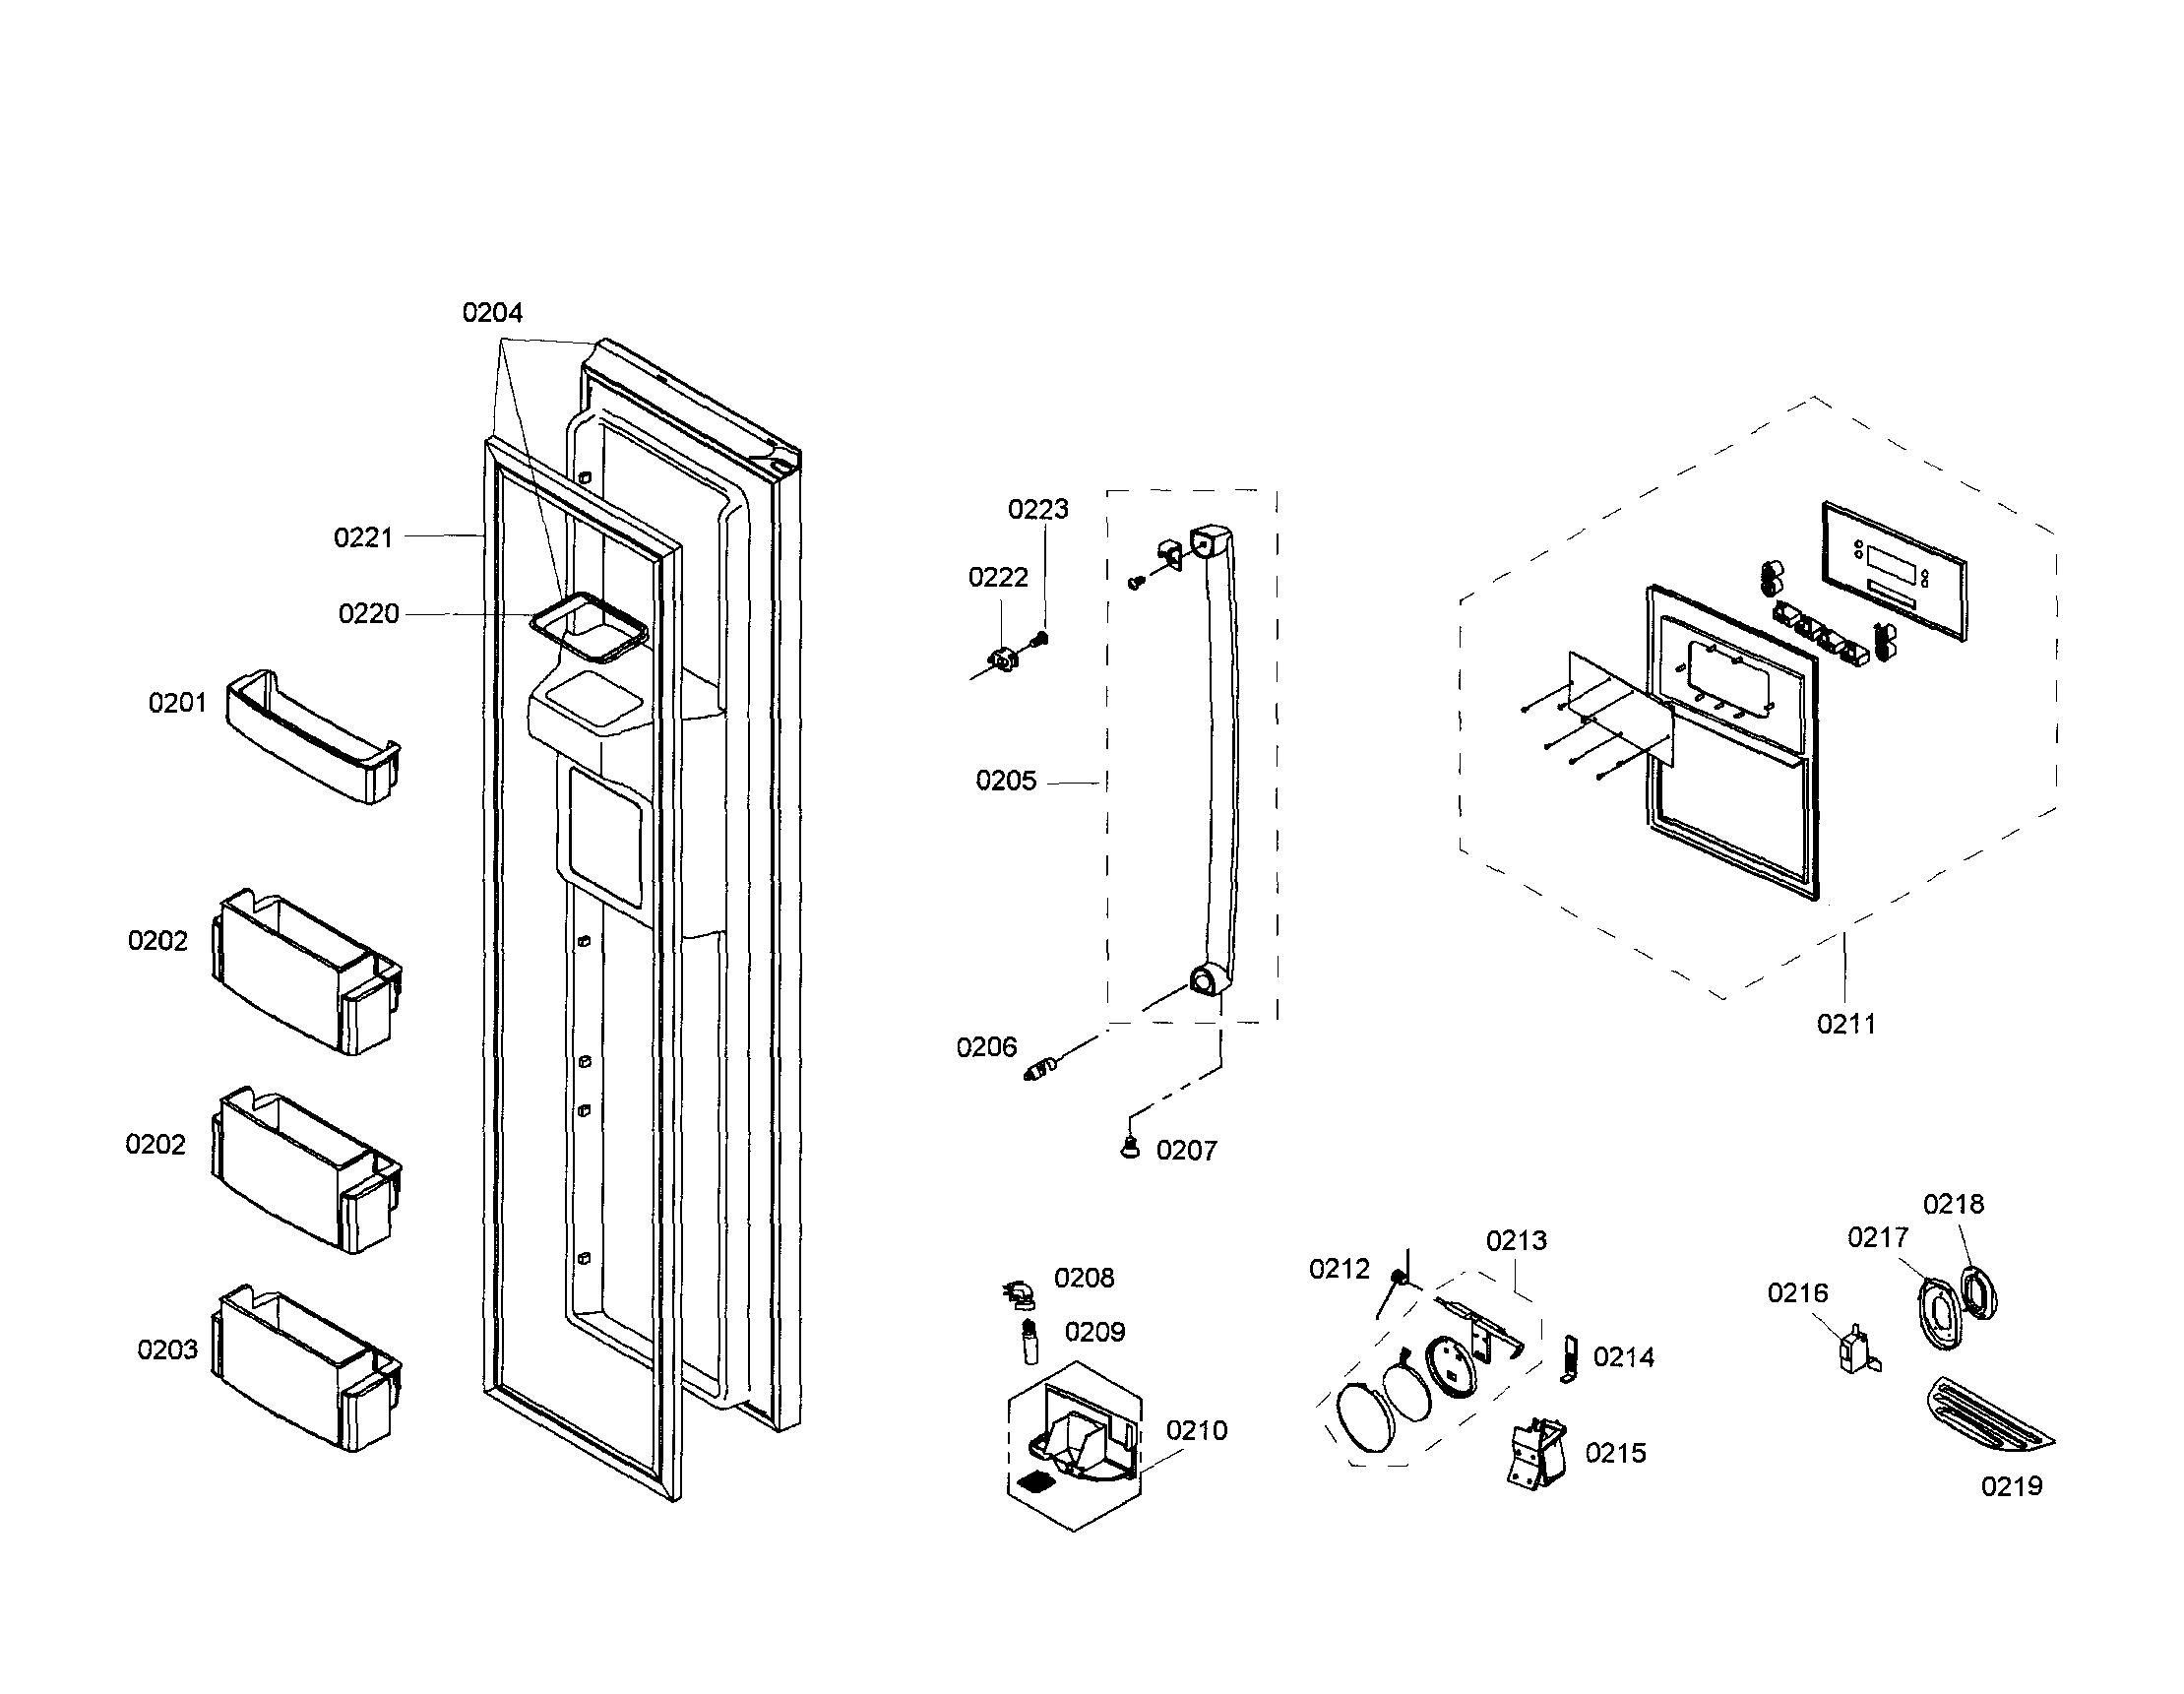 Bosch model B20CS50SNI/01 side-by-side refrigerator